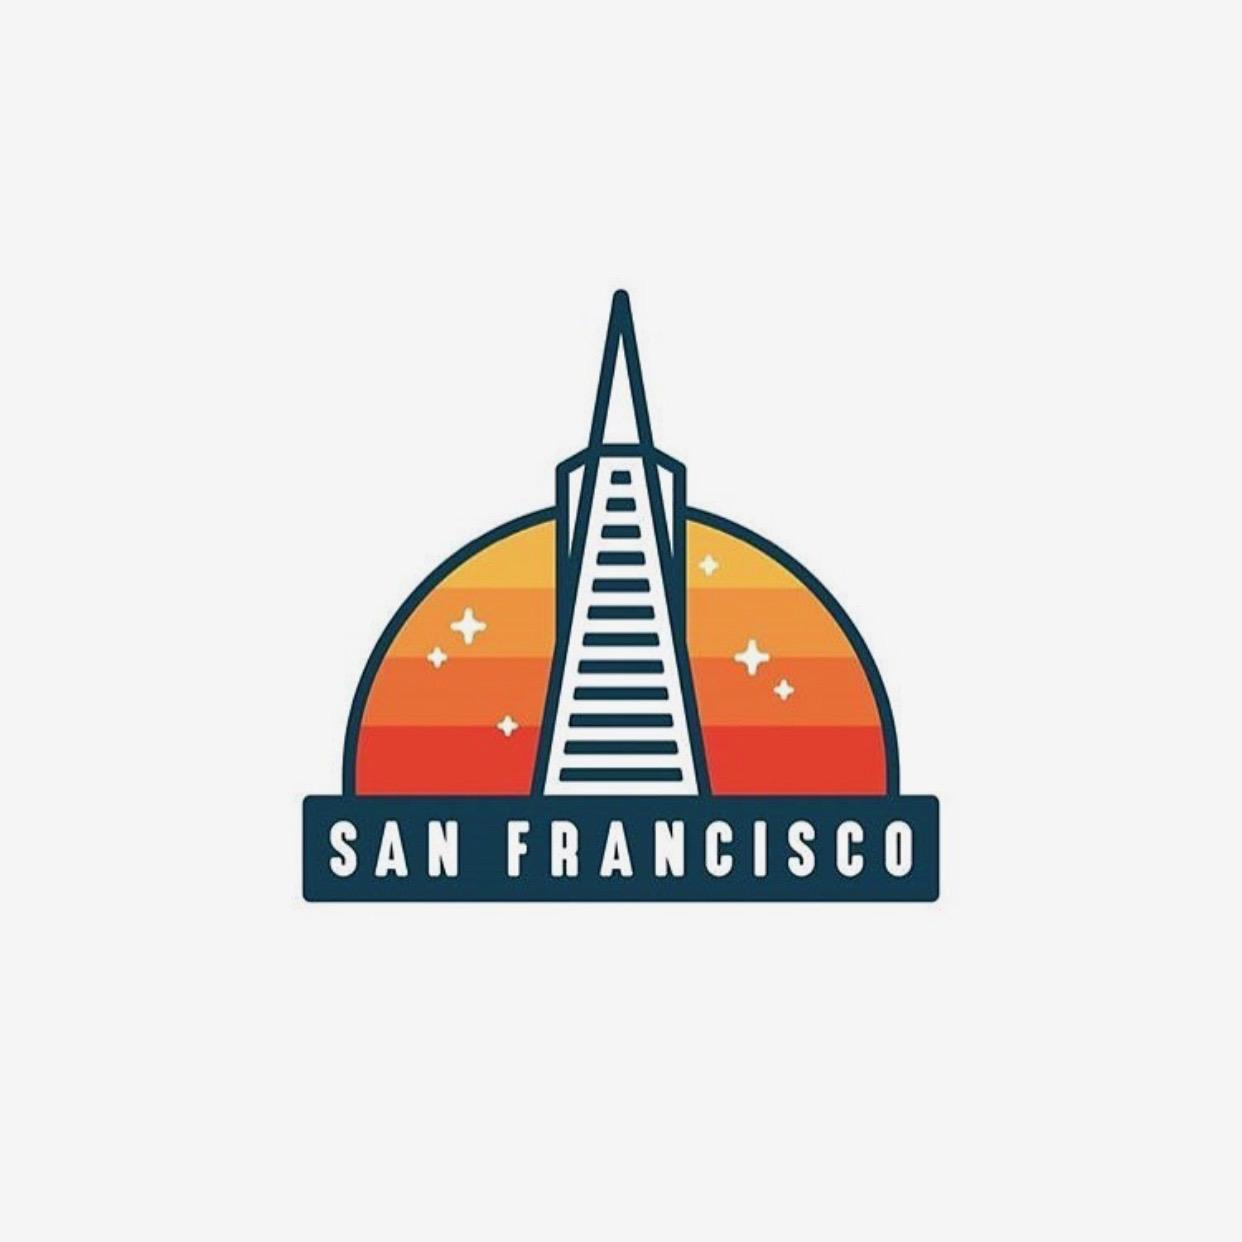 San Francisco animation by Kickstand